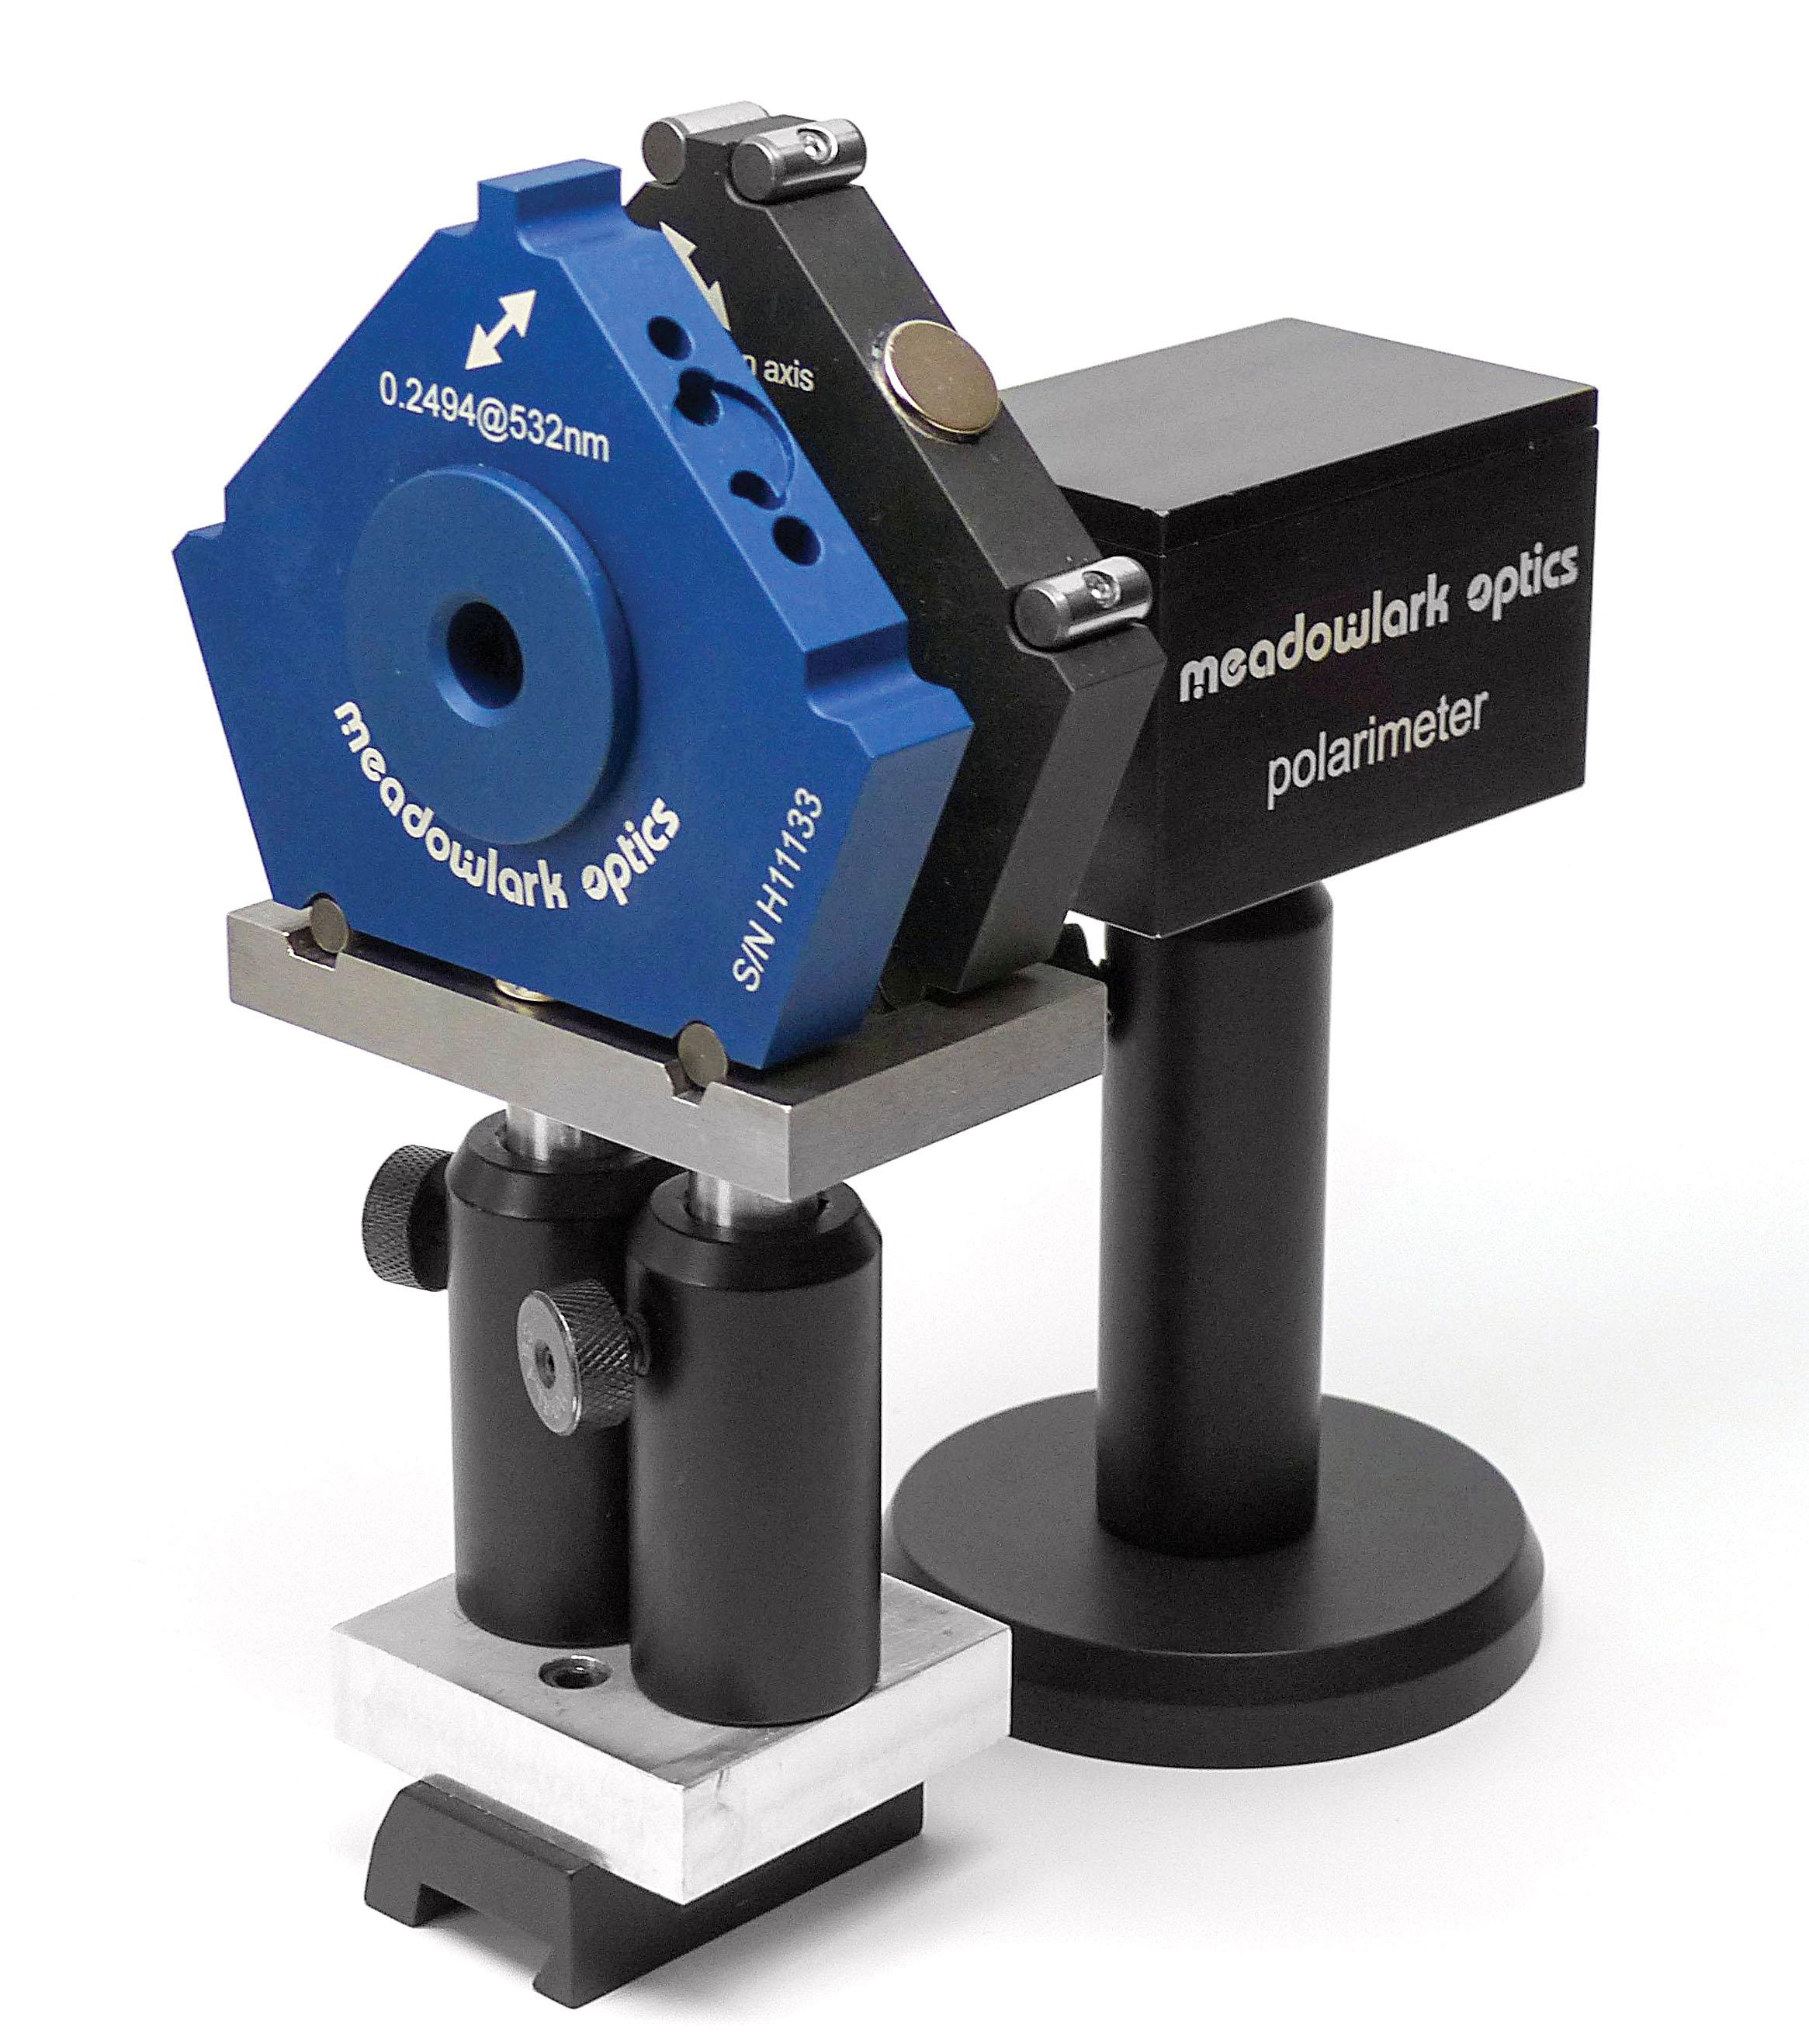 http://www.lionadv.com/email/meadowlark-optics-polarimeter.jpg